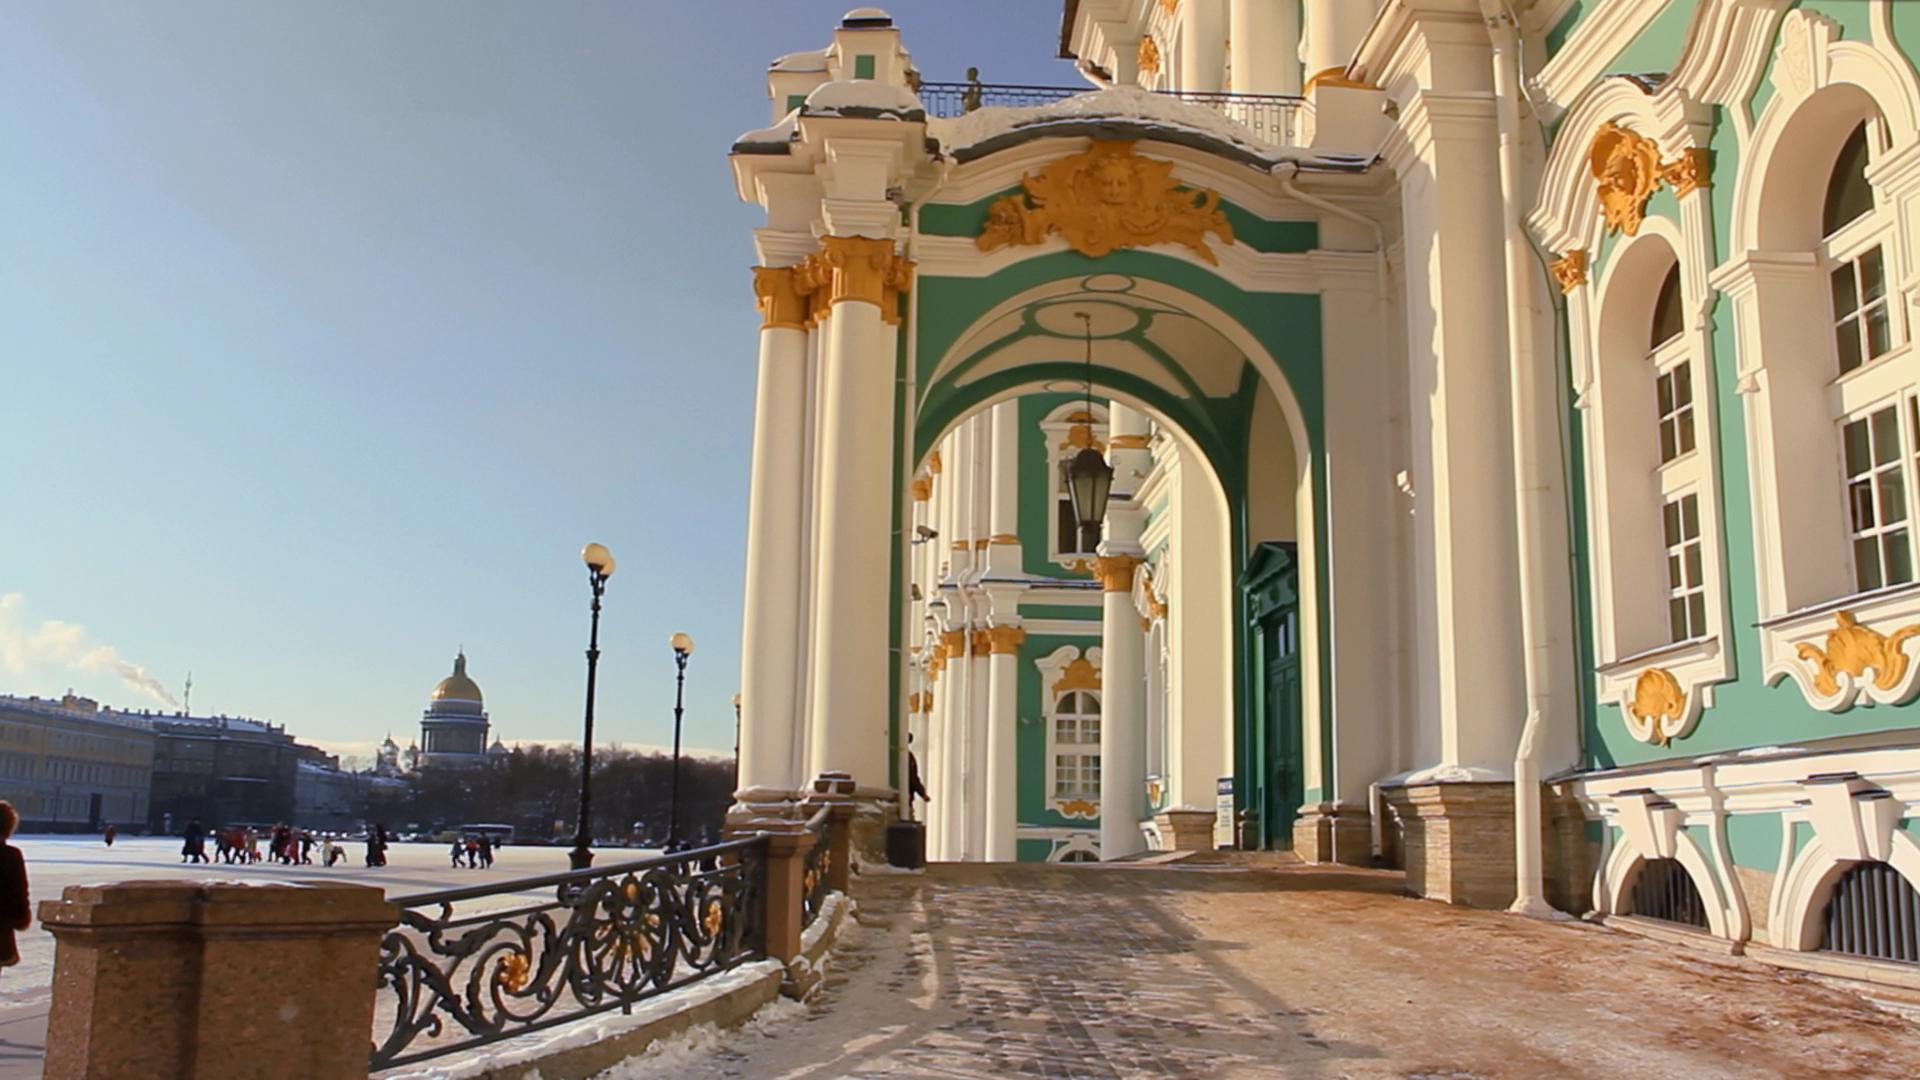 http://i4.imageban.ru/out/2012/04/02/6c670e9cab4bc3b13c00fb0b089e20d3.png